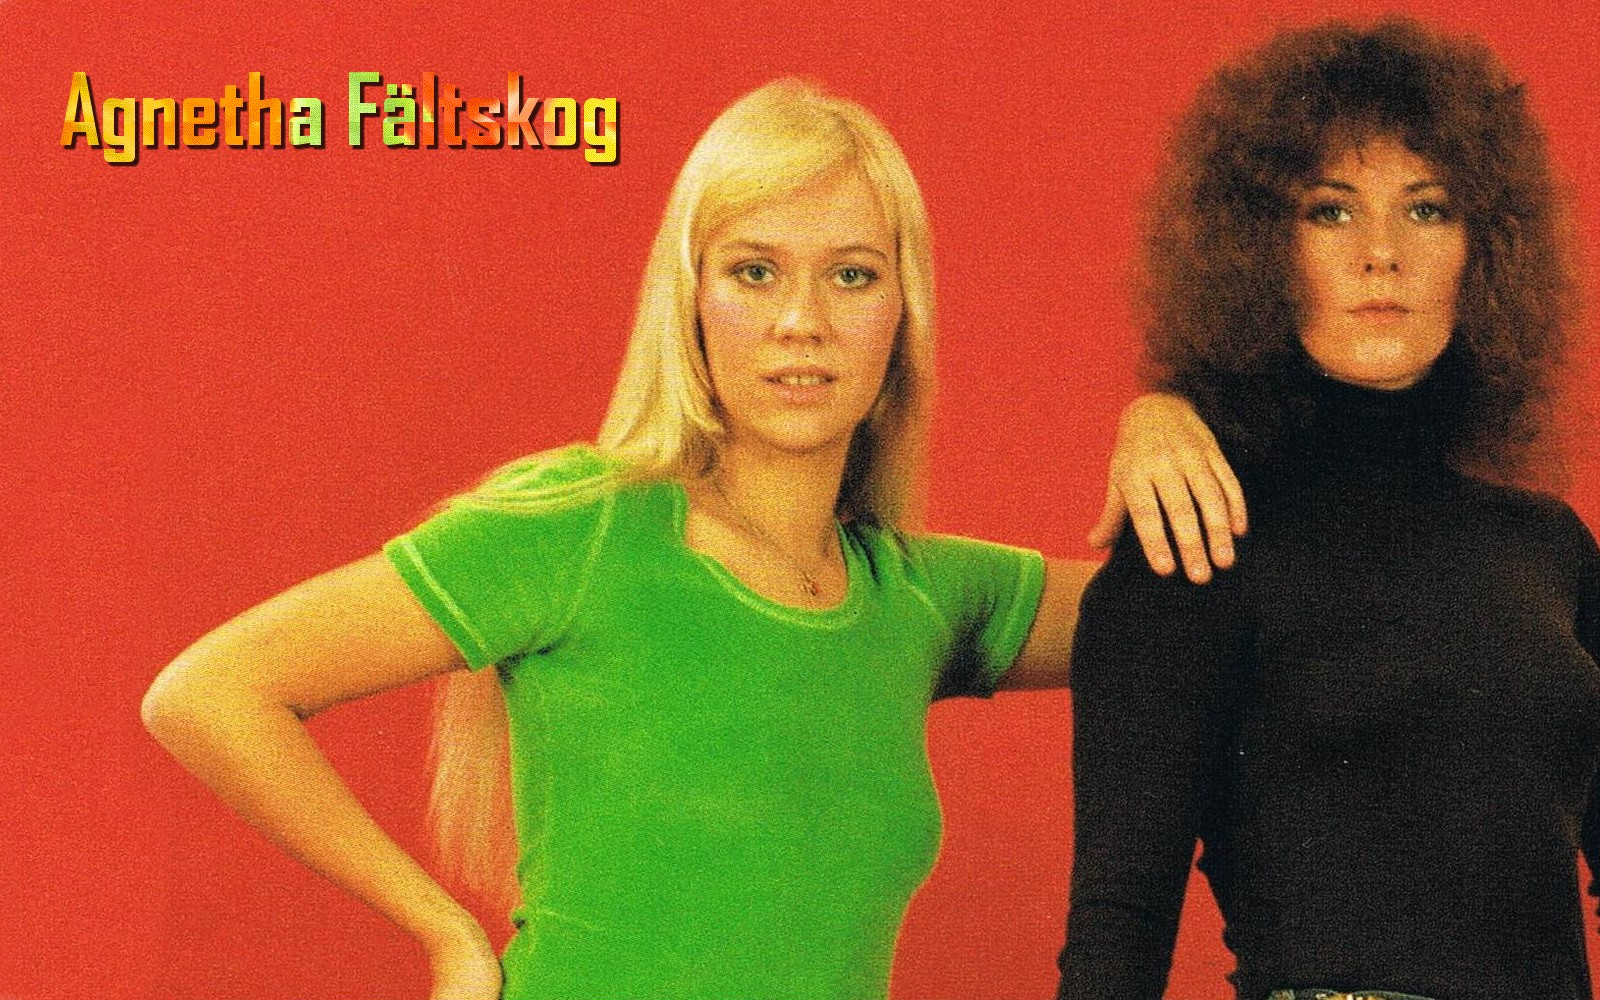 Filmovízia: Agnetha Fältskog Wallpaper [ABBA]